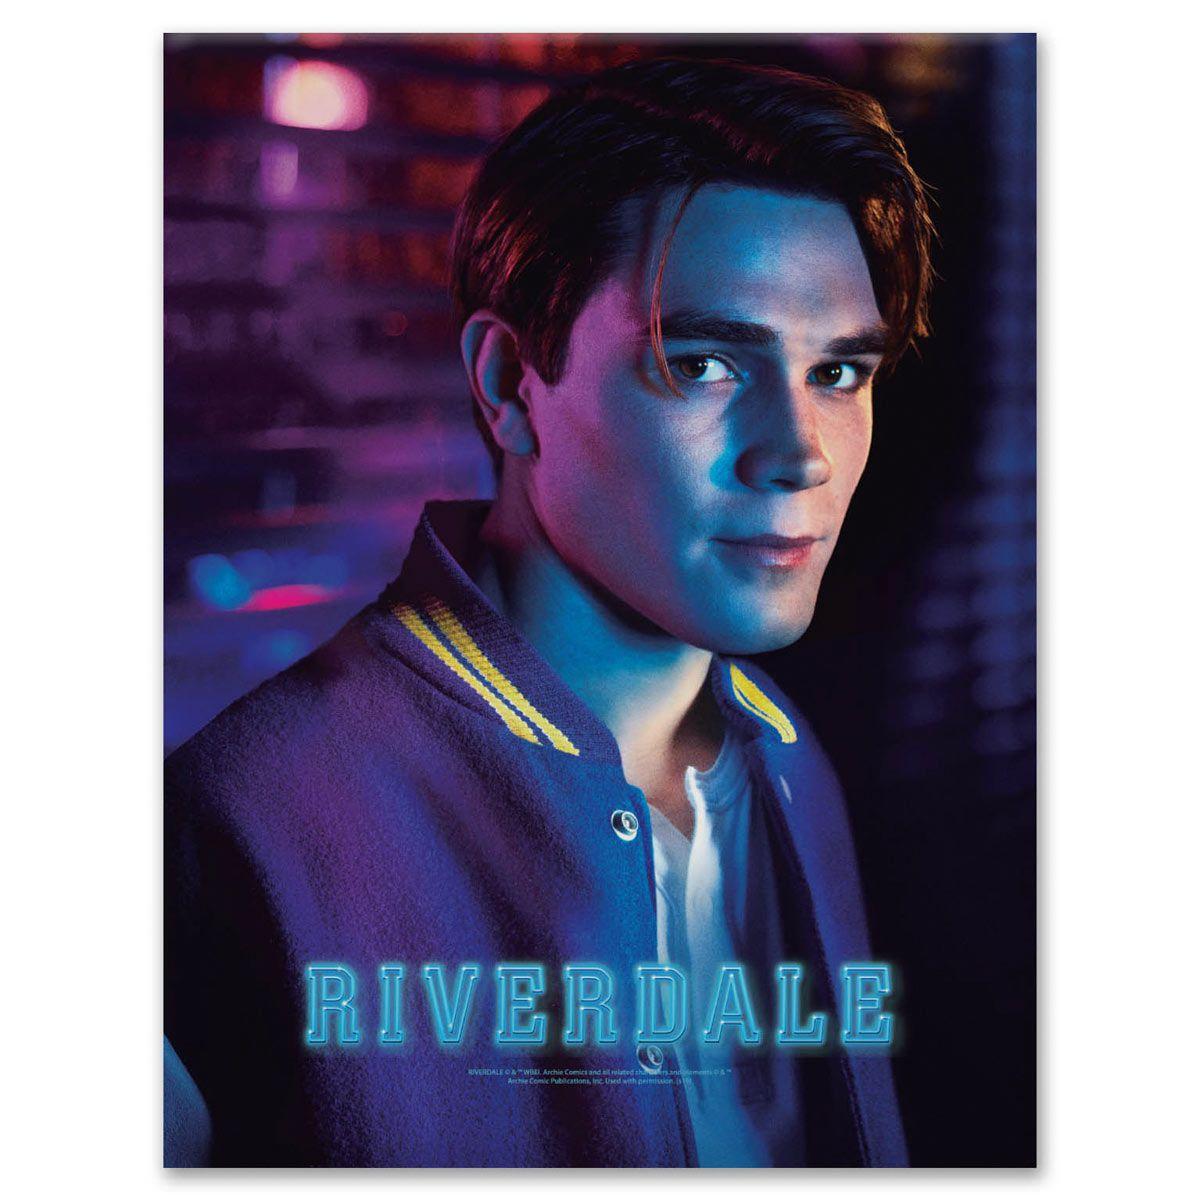 Placa Metal Riverdale Archie Andrews